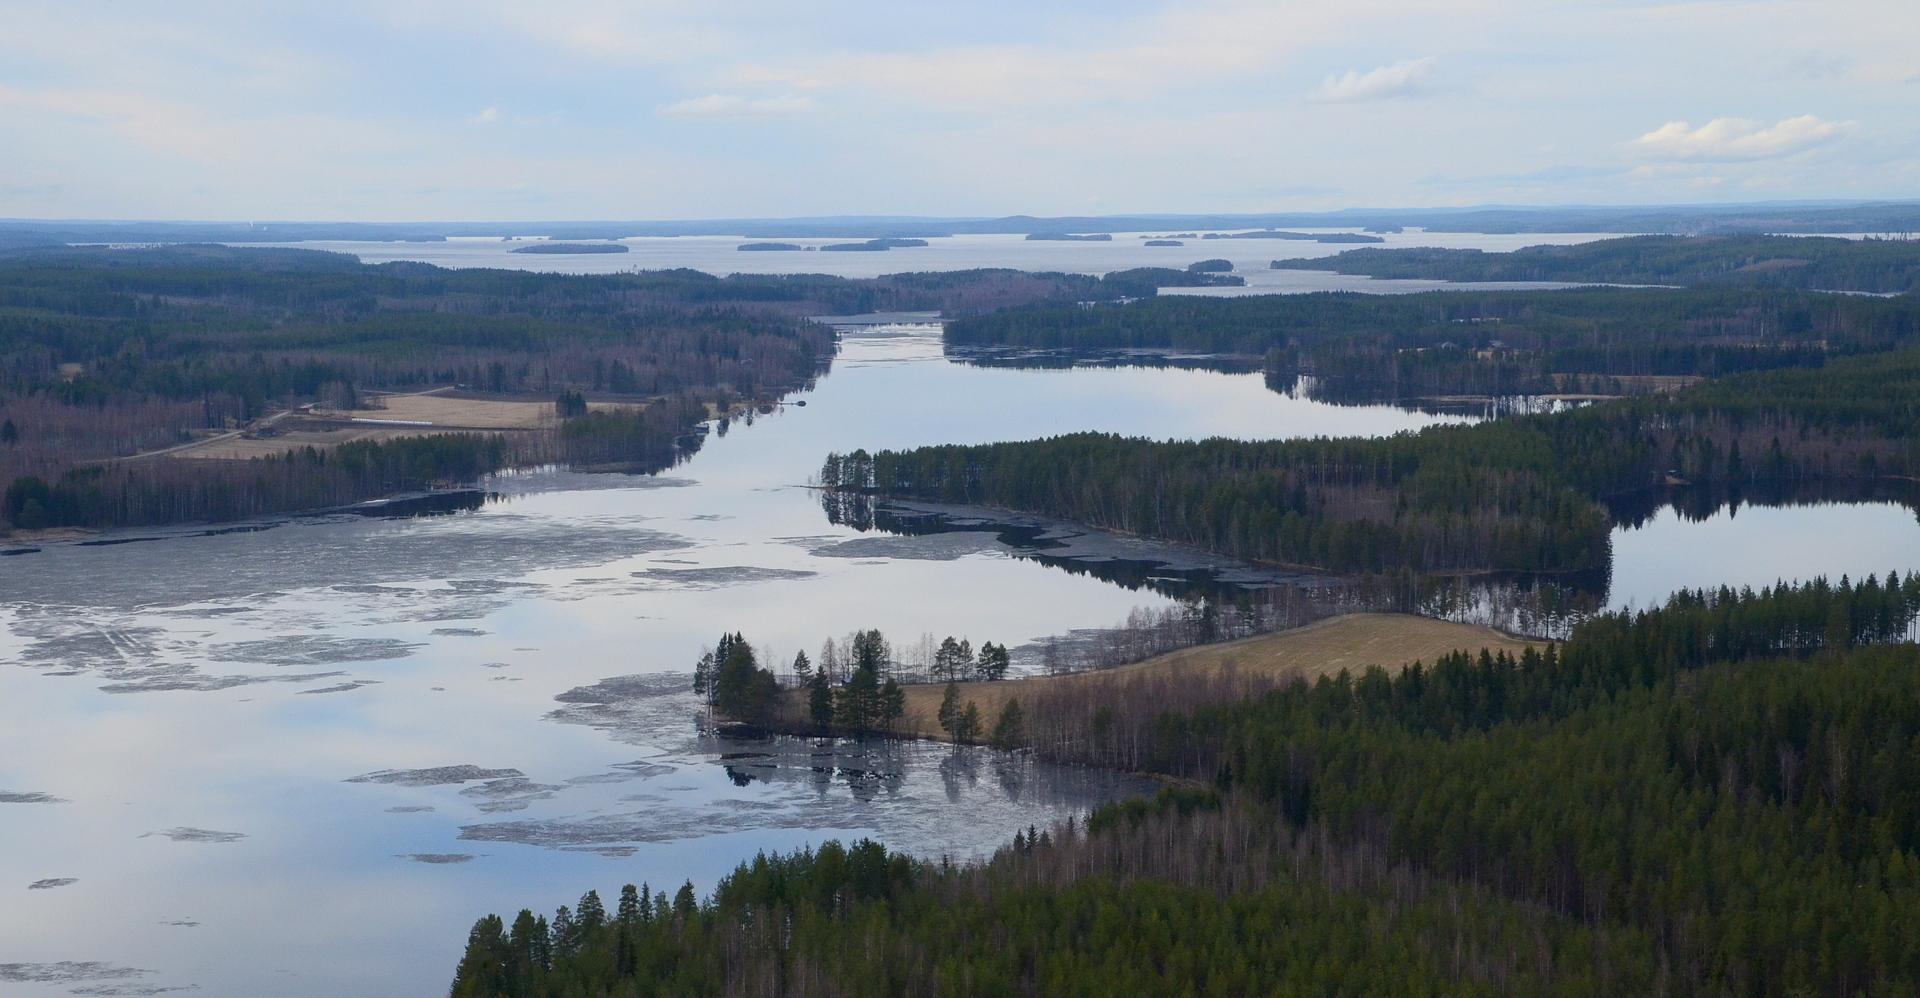 Houninniemi, Kattilaniemi, Vapaniemi. 29.4.2016